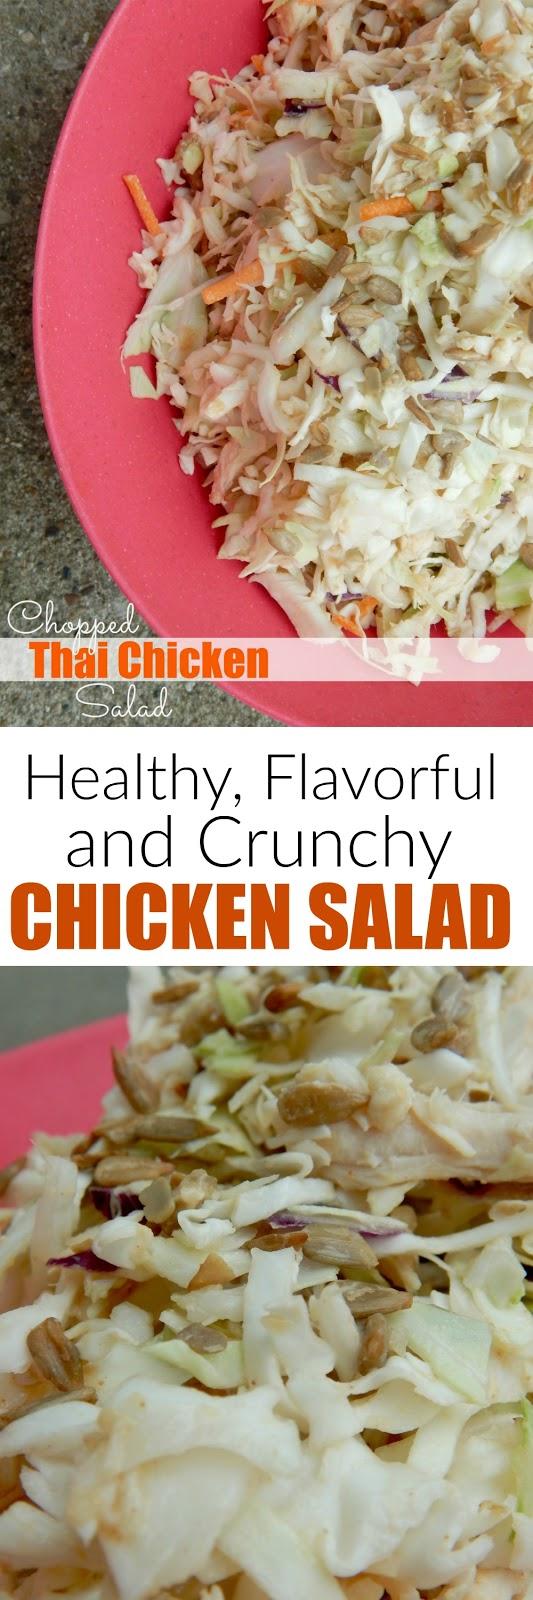 Chopped Thai Chicken Salad...a crunchy, flavorful, light and tasty salad! (sweetandsavoryfood.com)